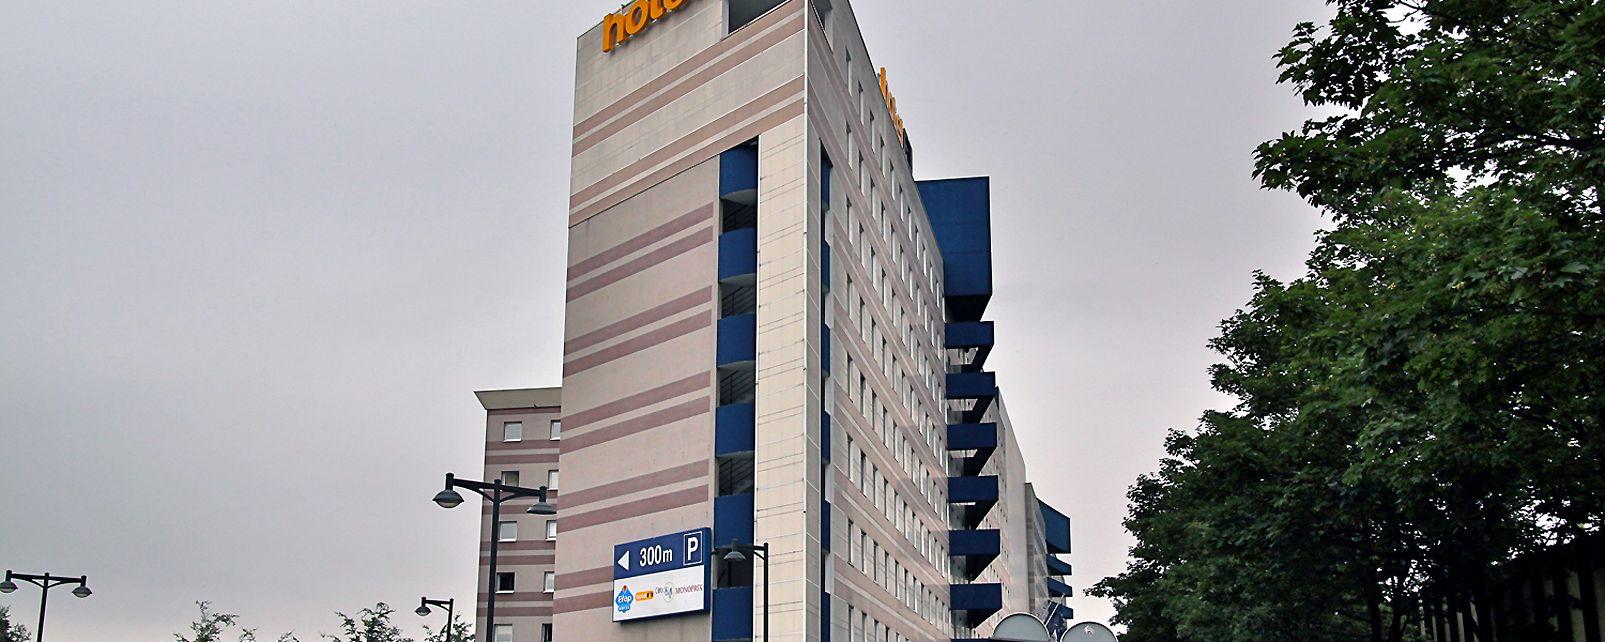 Hotel f1 paris porte de montmartre - Hotelf1 porte de montmartre ...